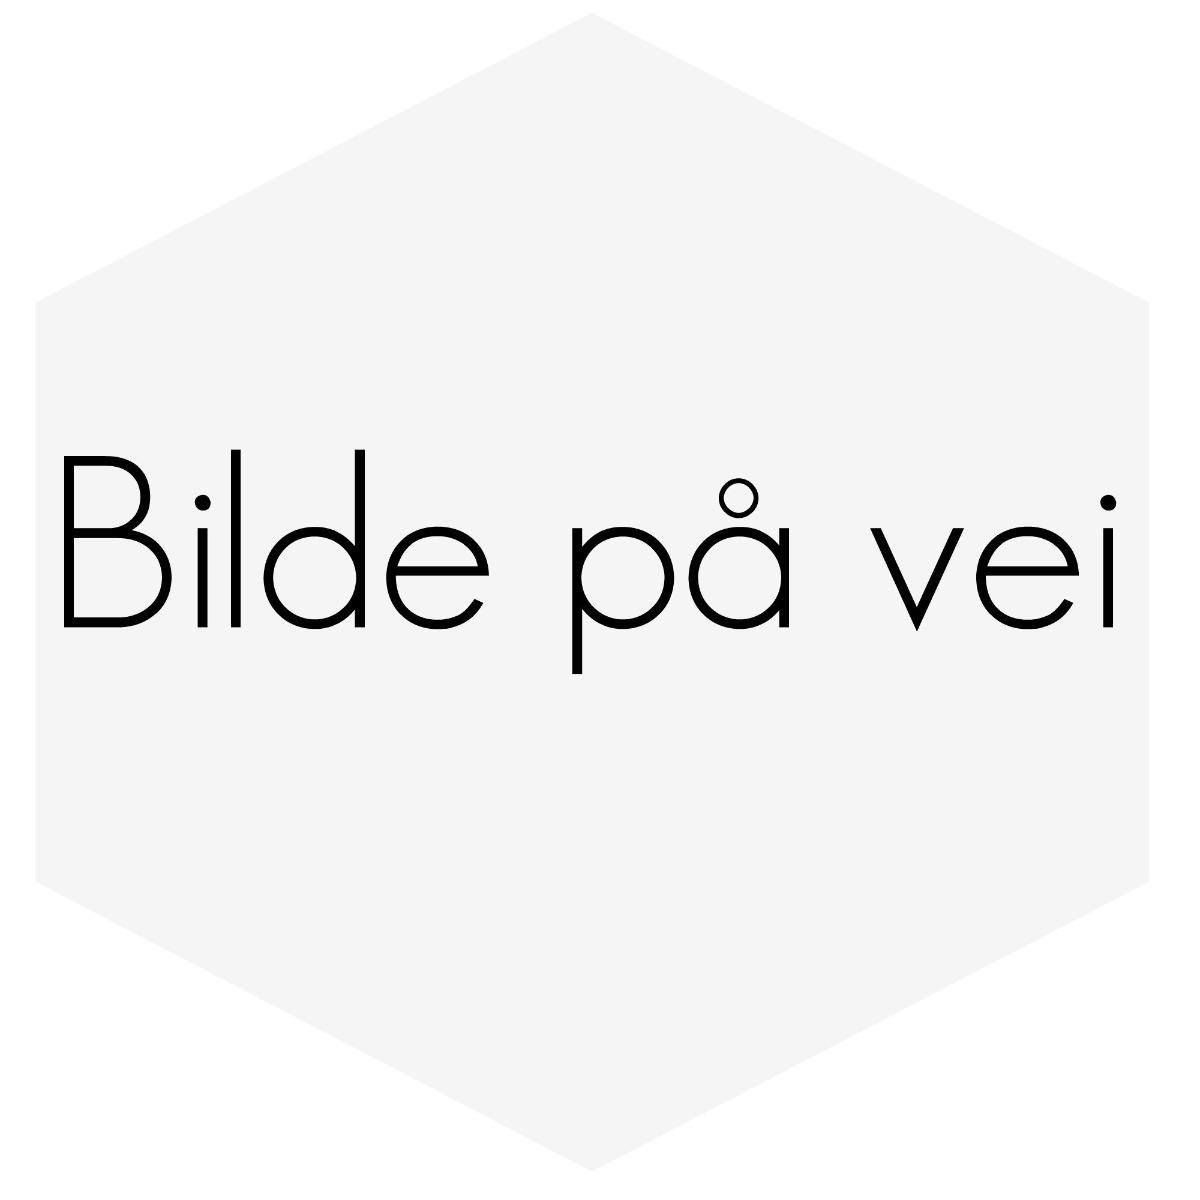 LØPEHJUL / REIMHJUL REG.REIM B234 740 16V 88-90